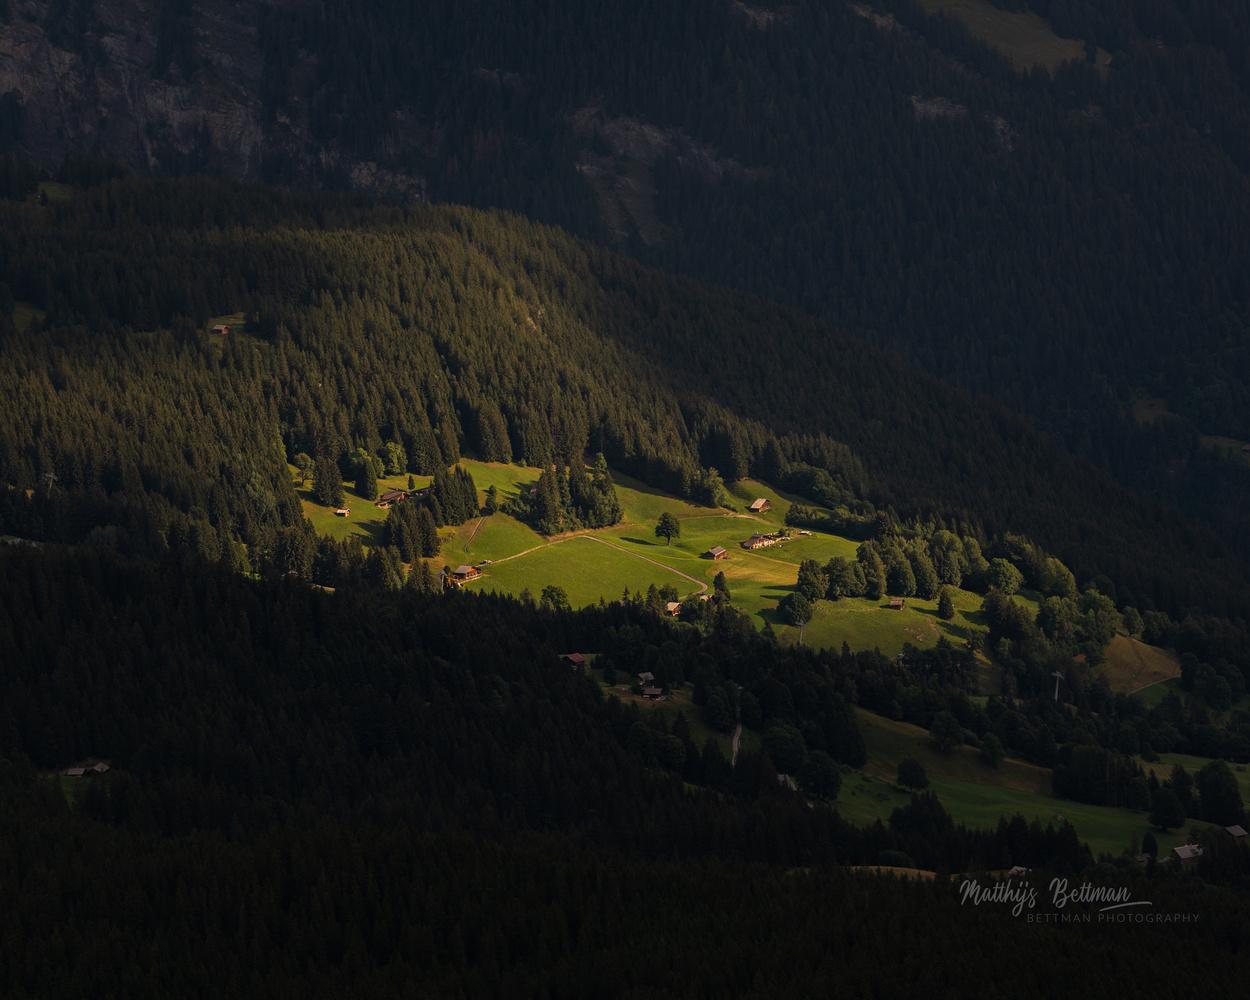 Eiger Ultra Trail with sunrise by Matthijs Bettman